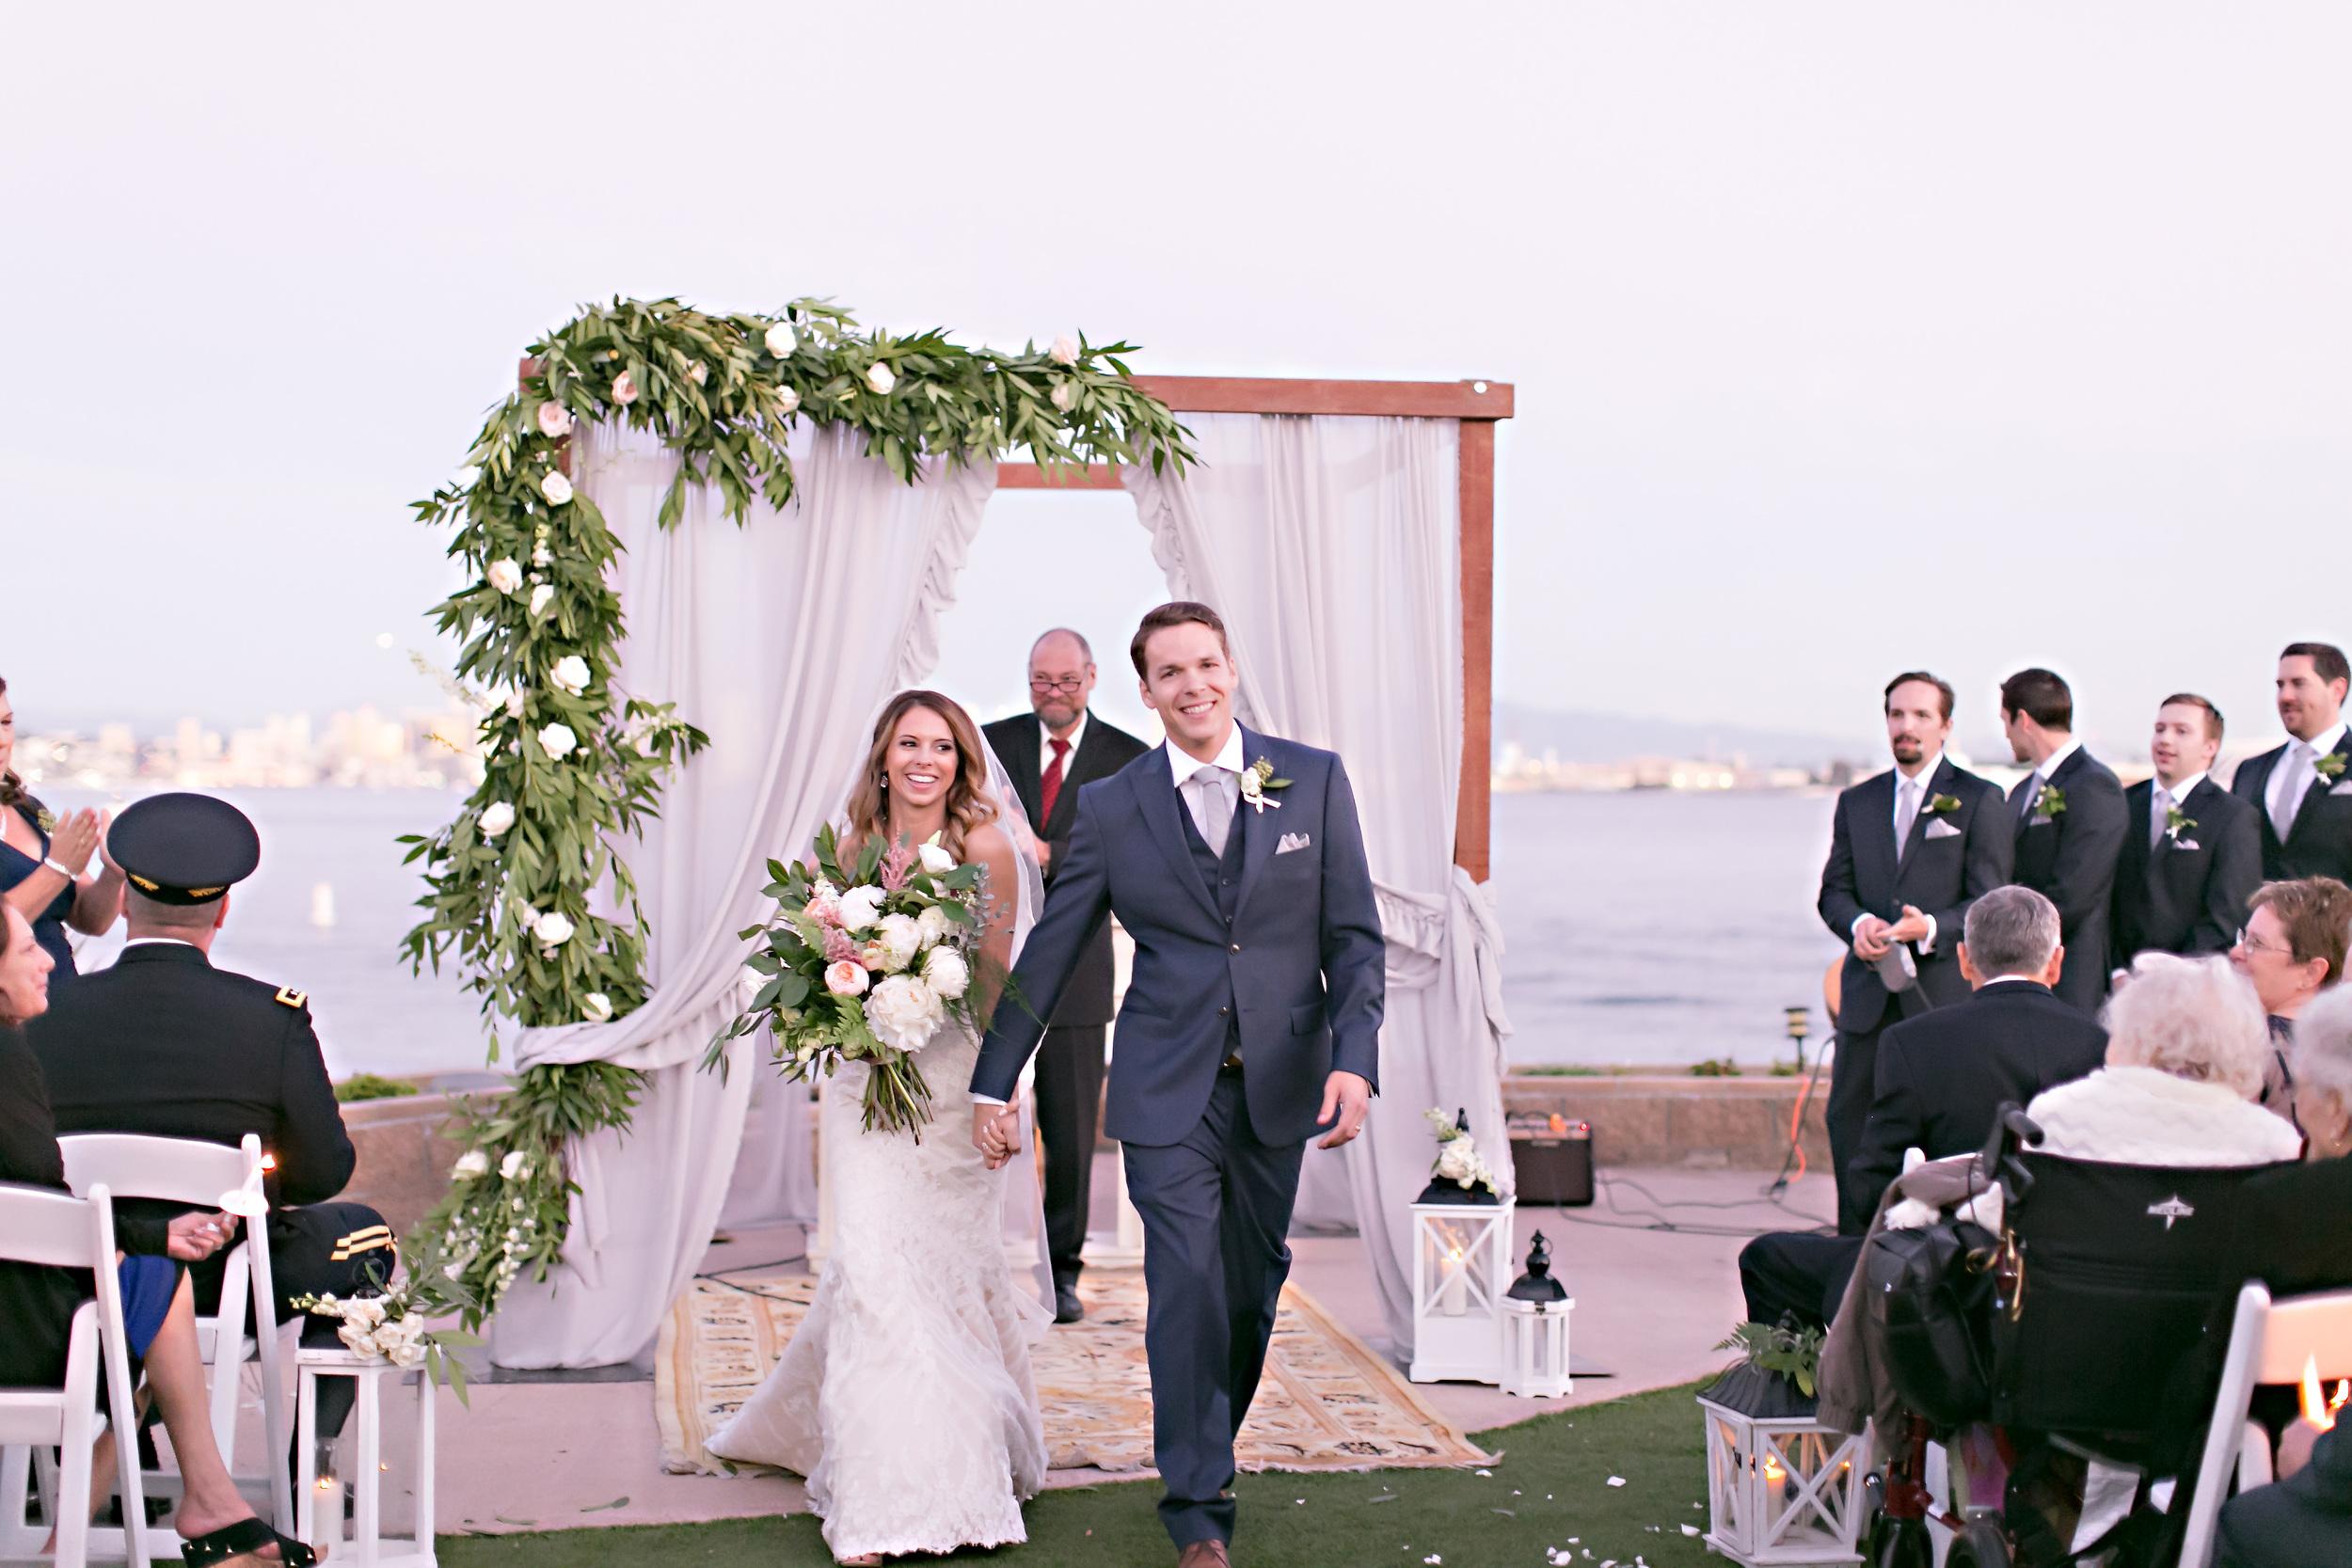 romanticweddingflowers.jpg